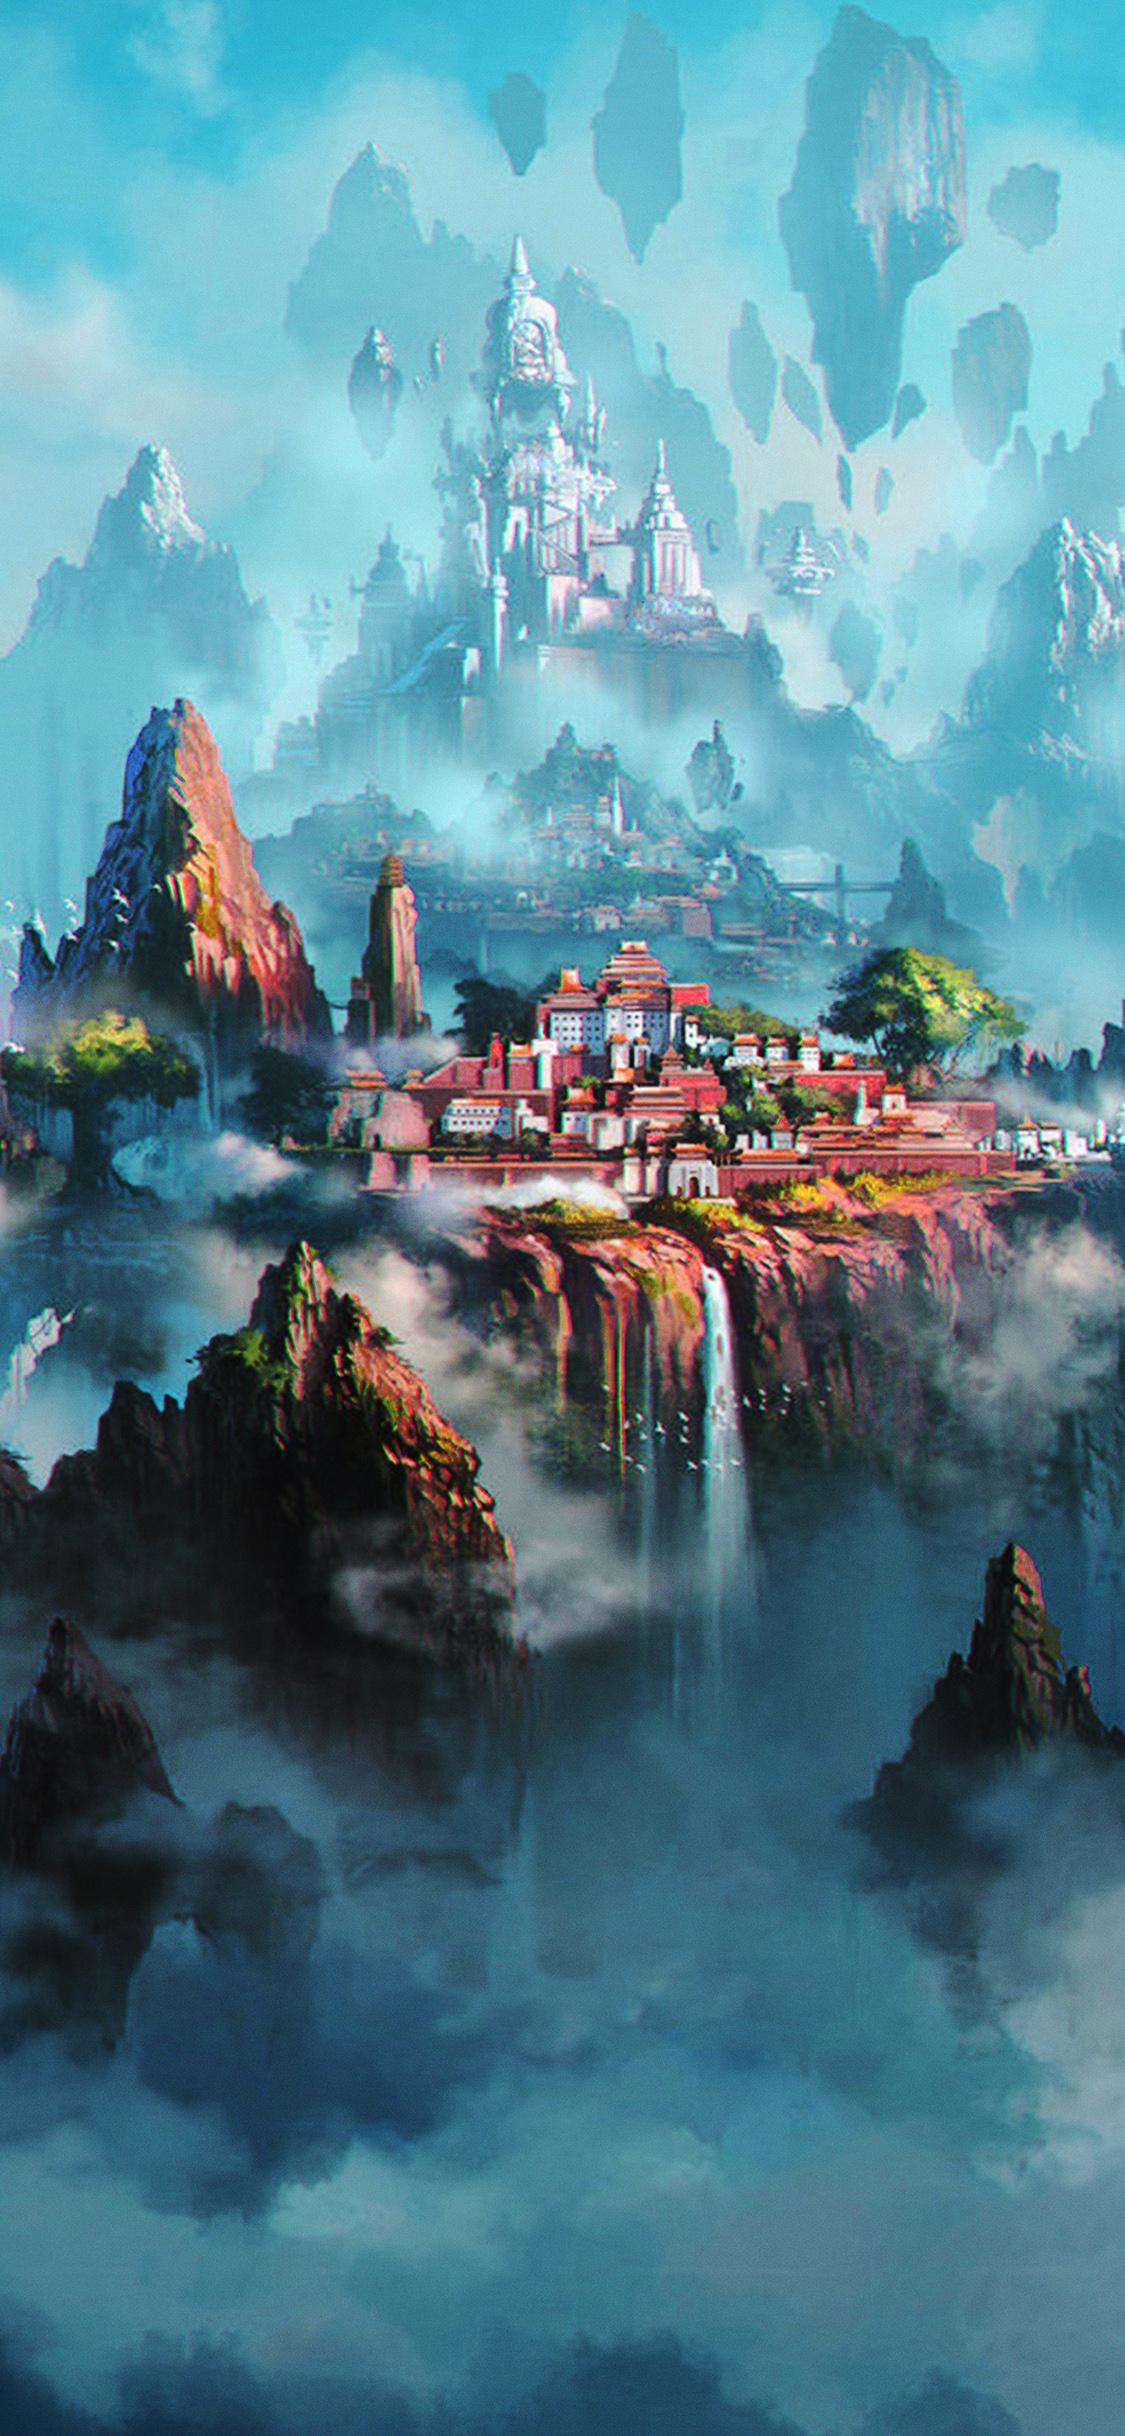 Av36 Cloud Town Fantasy Anime Liang Xing Illustration Art Green